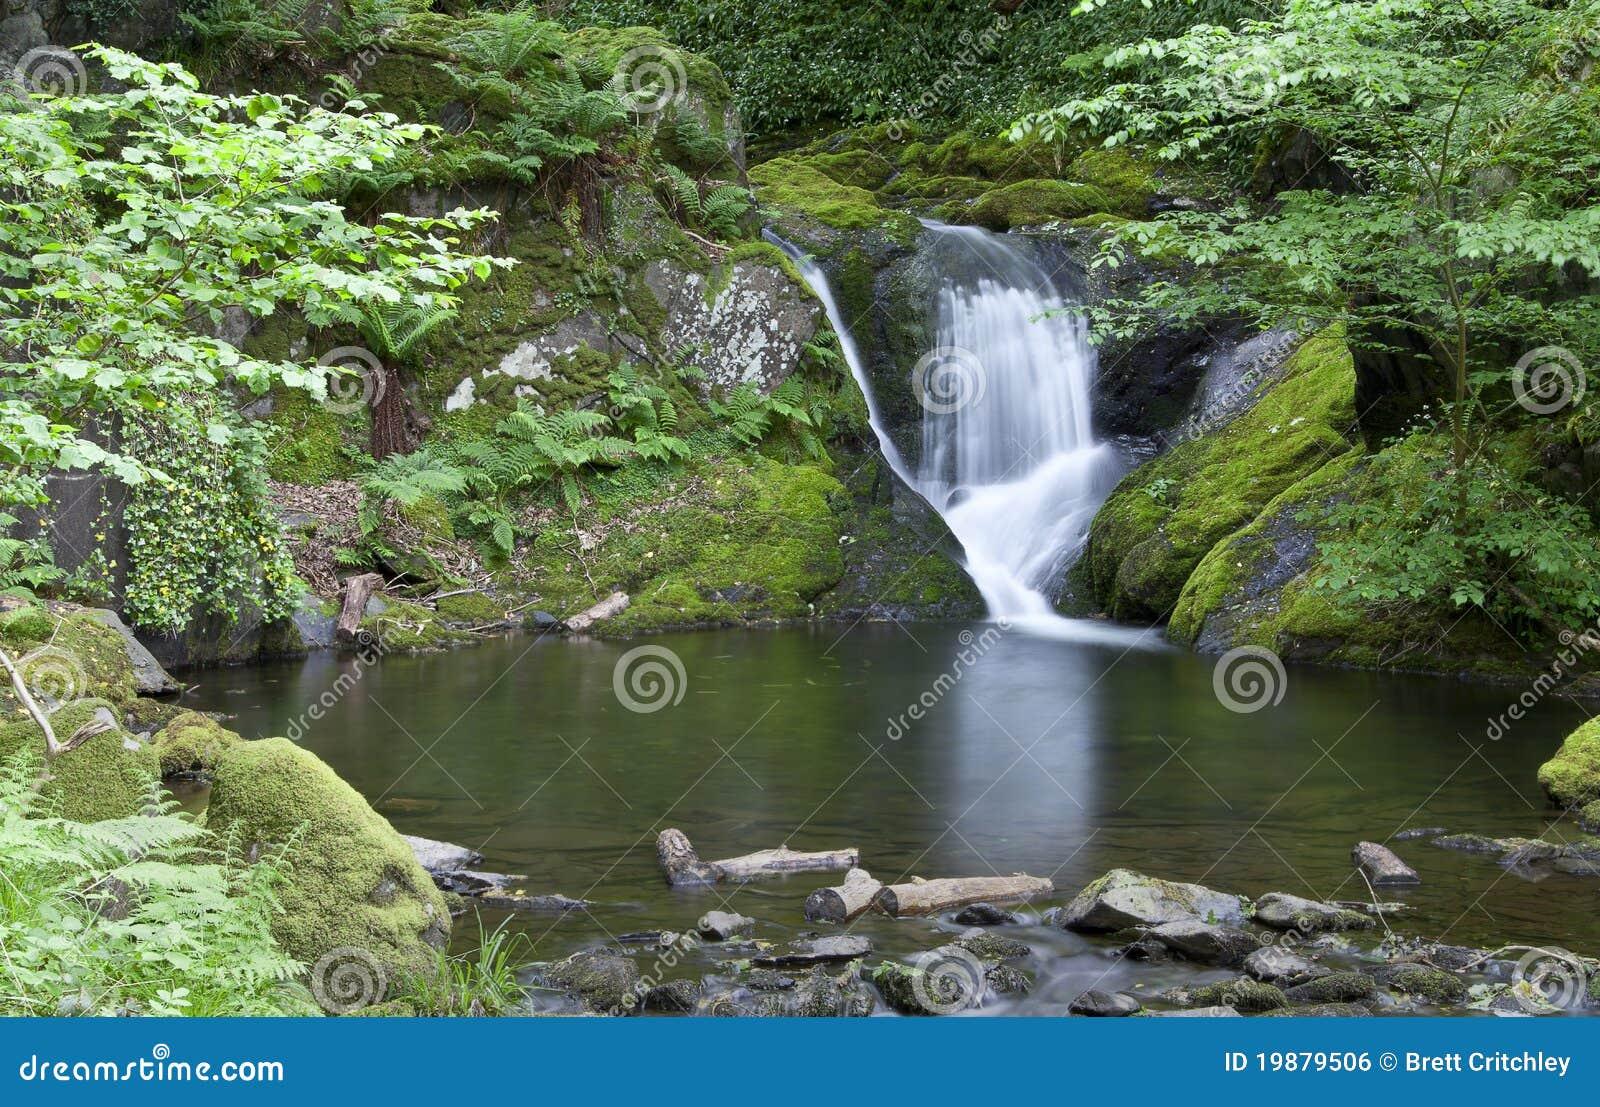 Wasserfall und pool stockfoto bild von wasserfall frech 19879506 - Pool wasserfall ...